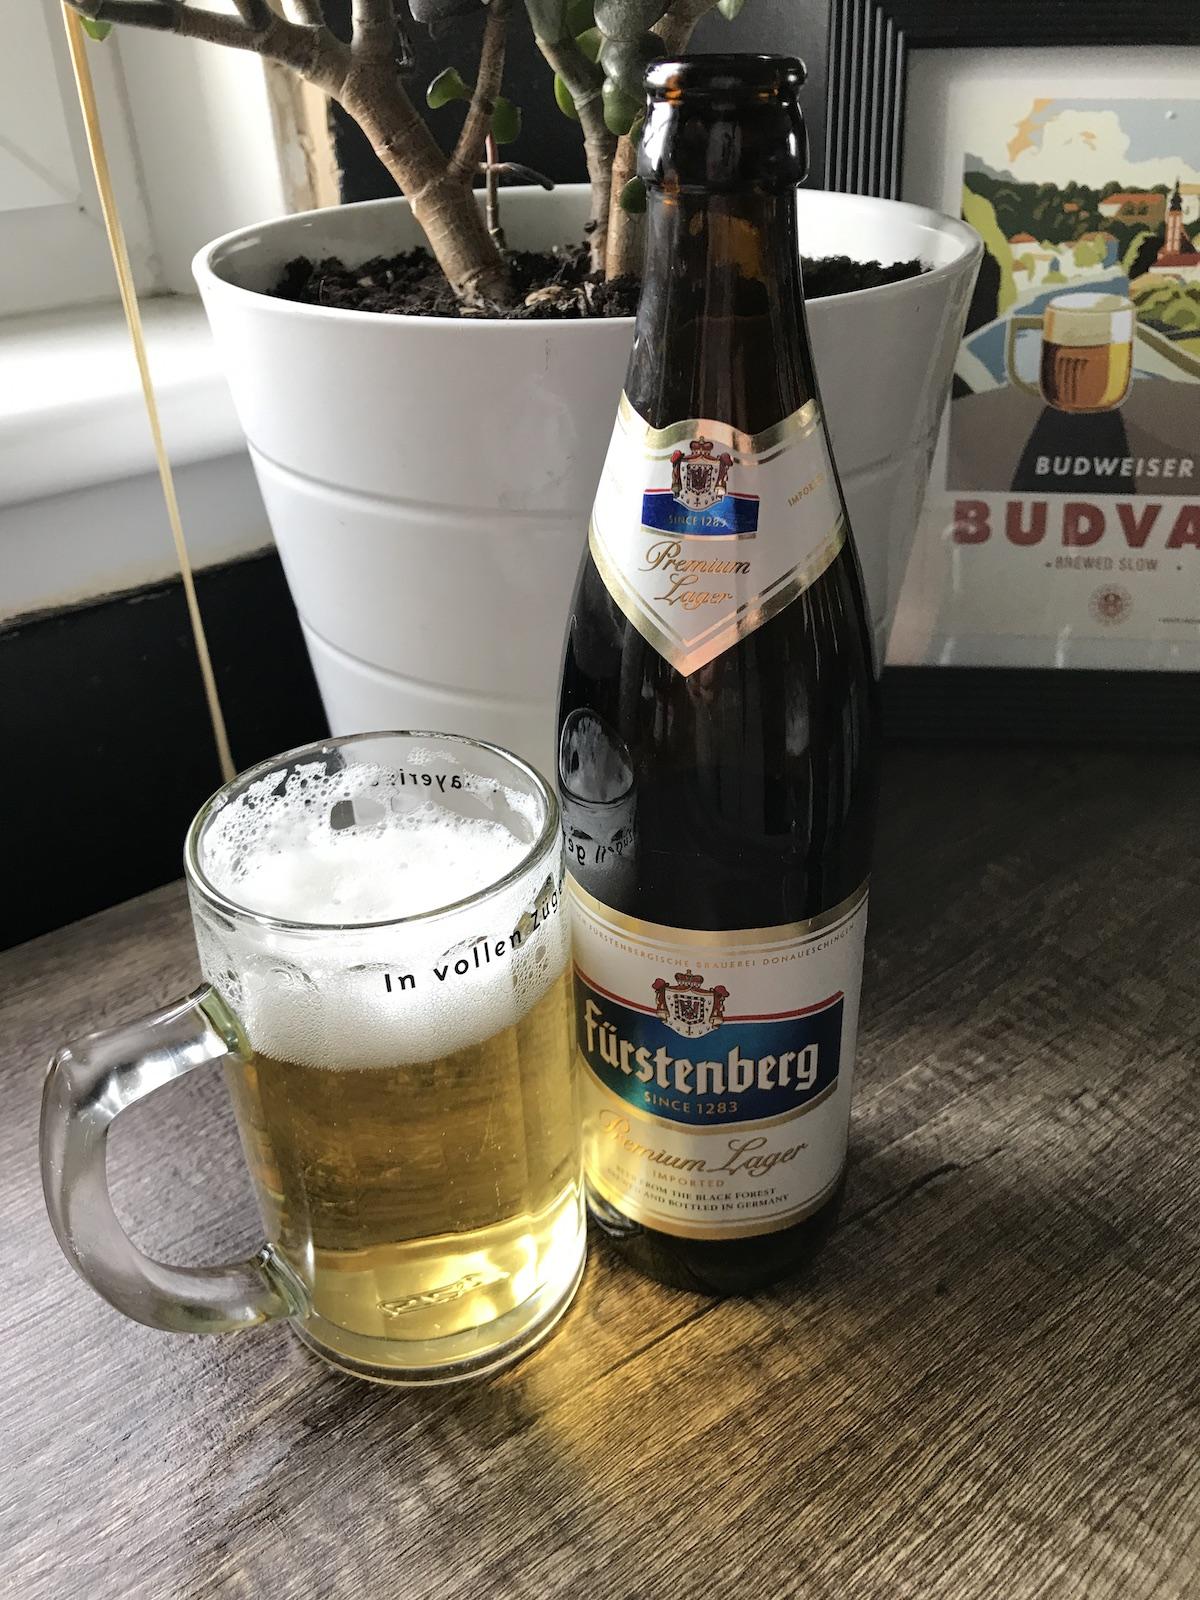 The Beer Town Furstenberg